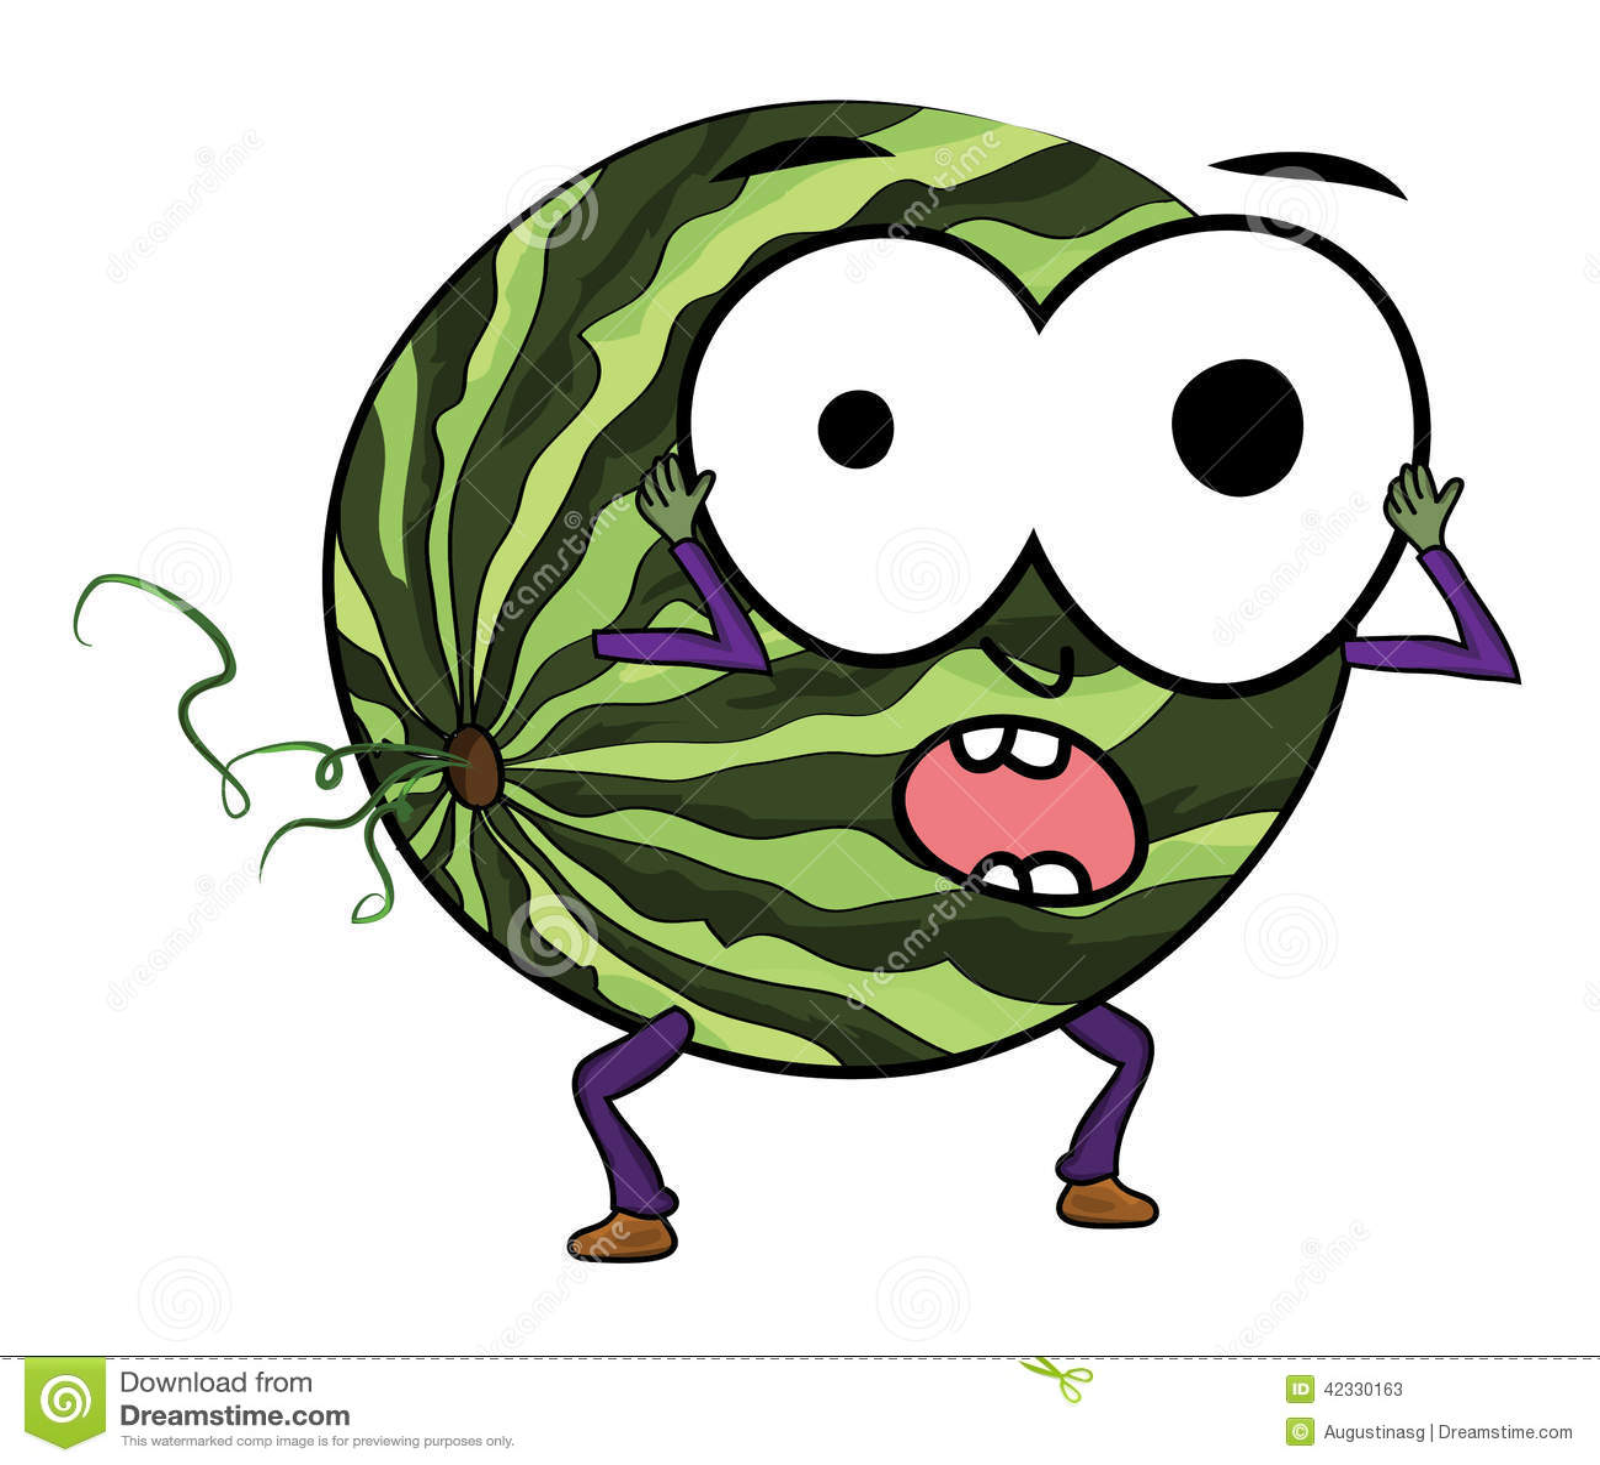 cartoon characters cartoon raspberry drunk cartoon character cartoonWatermelon Cartoon Characters